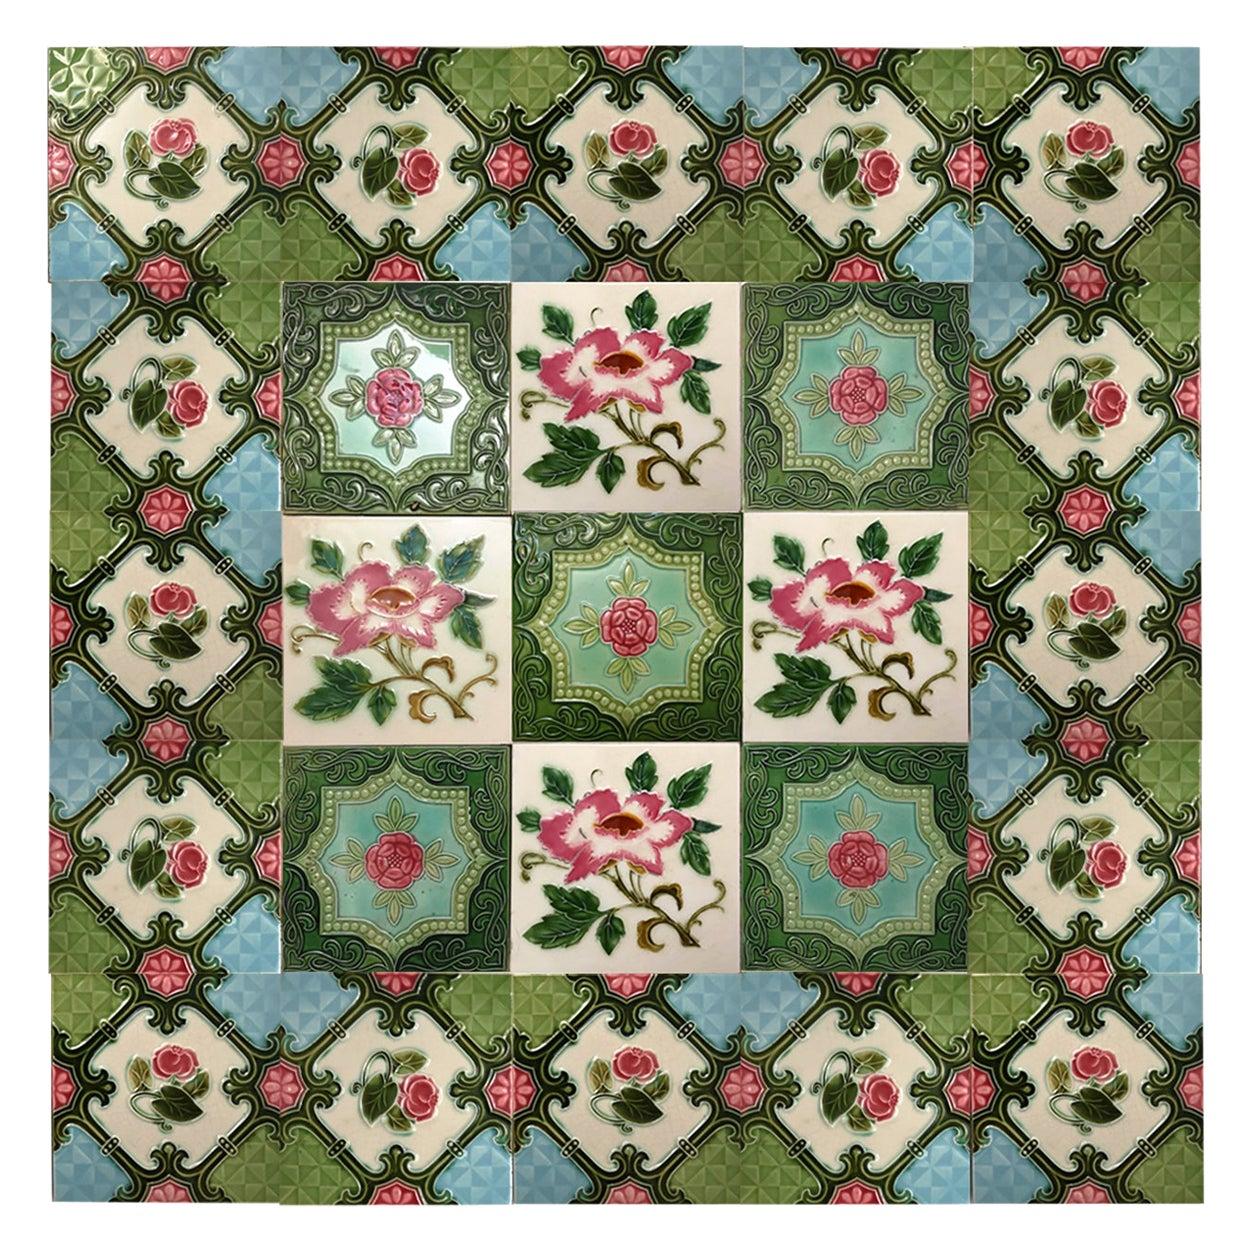 Mix of 25 Glazed Art Nouveau Relief Tiles, Belga, circa 1930s